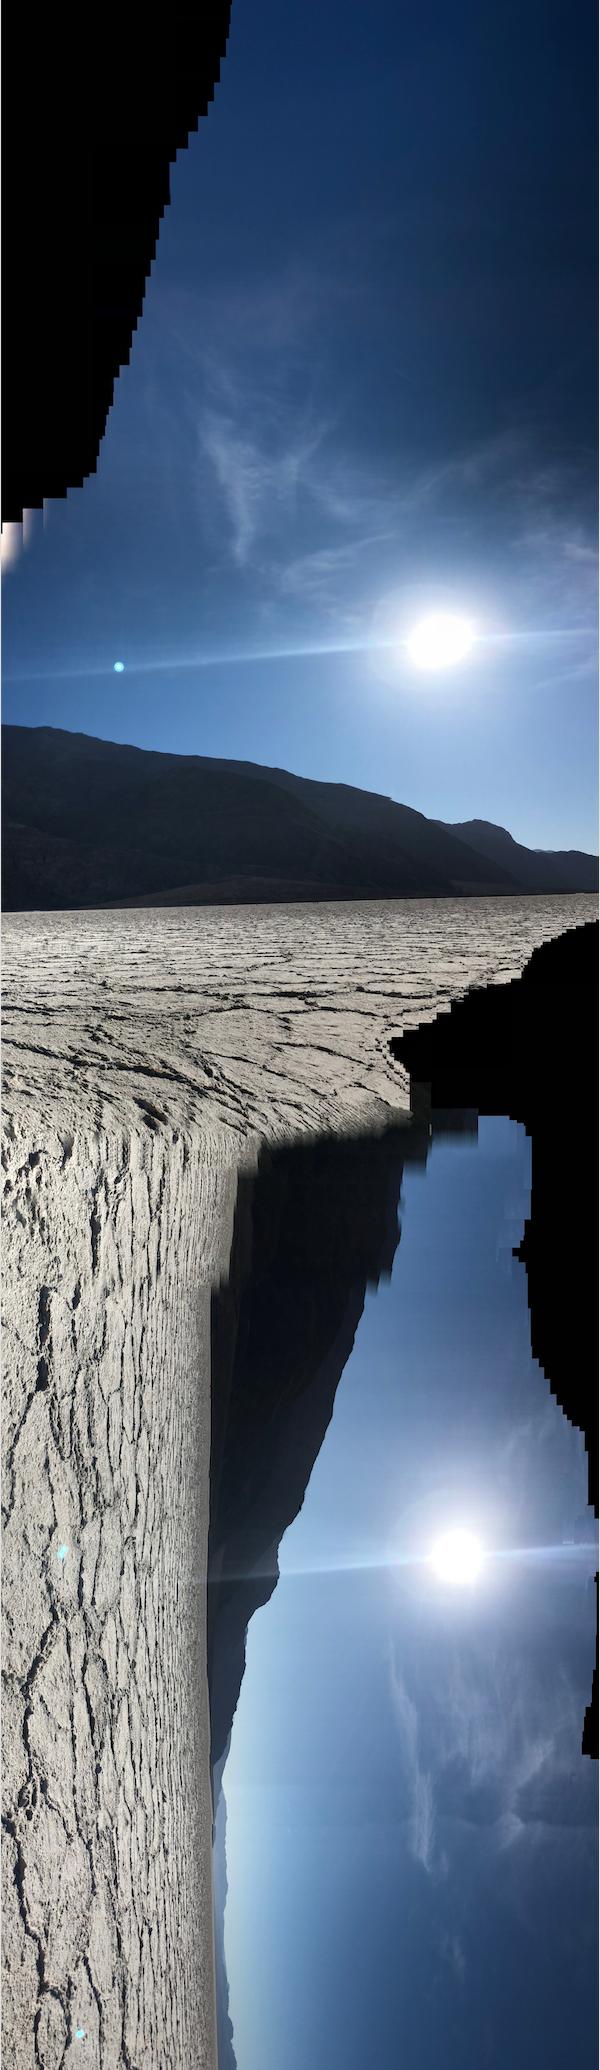 M⊕ binary  Photograph, 29 December, 2018  Copyright © Tennyson Woodbridge, 1963 to present